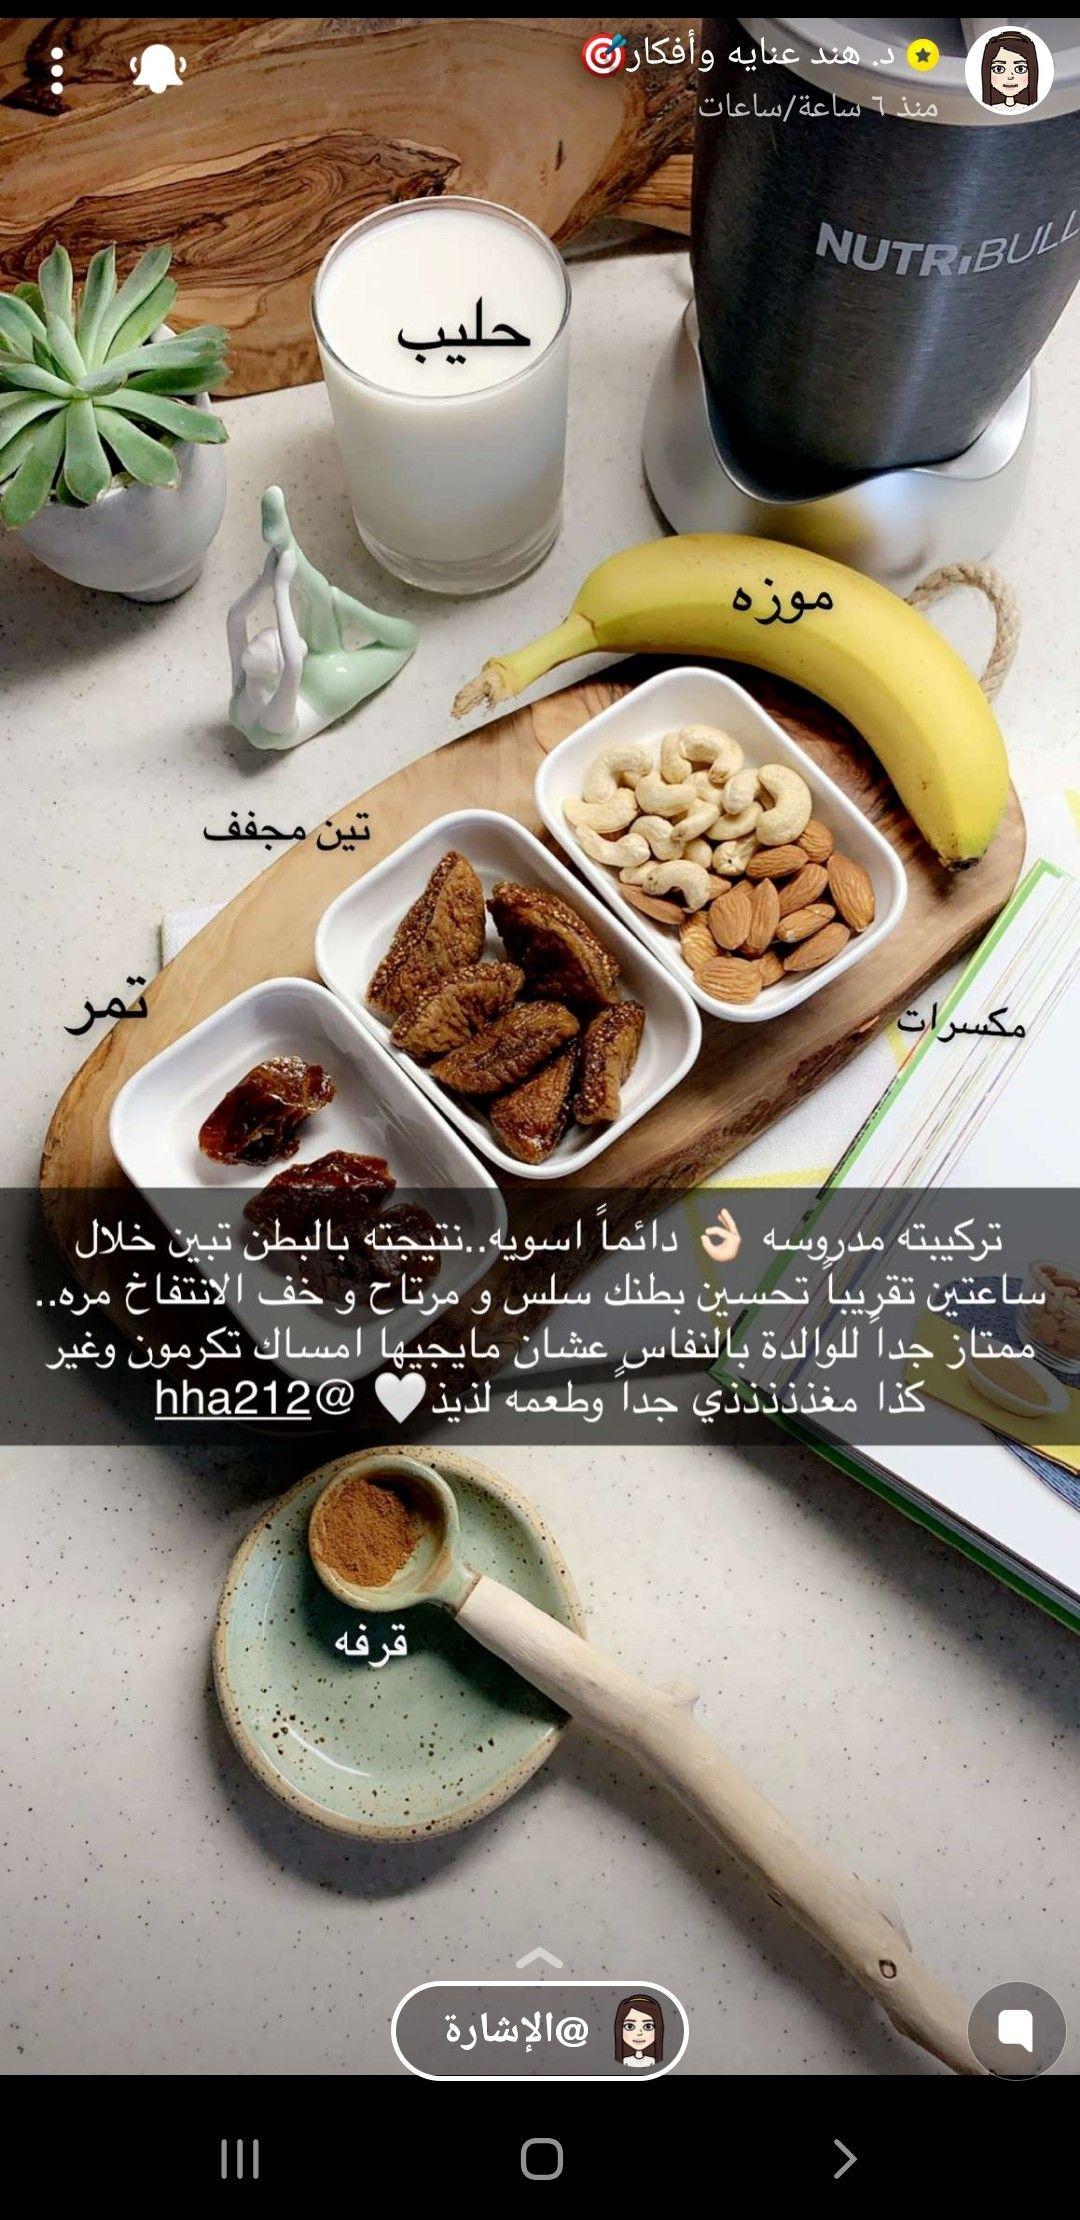 Pin By Aman On تغذية علاجية المعدة بيت الداء و الدواء توعية Health Facts Food Healthy Drinks Smoothies Good Healthy Recipes